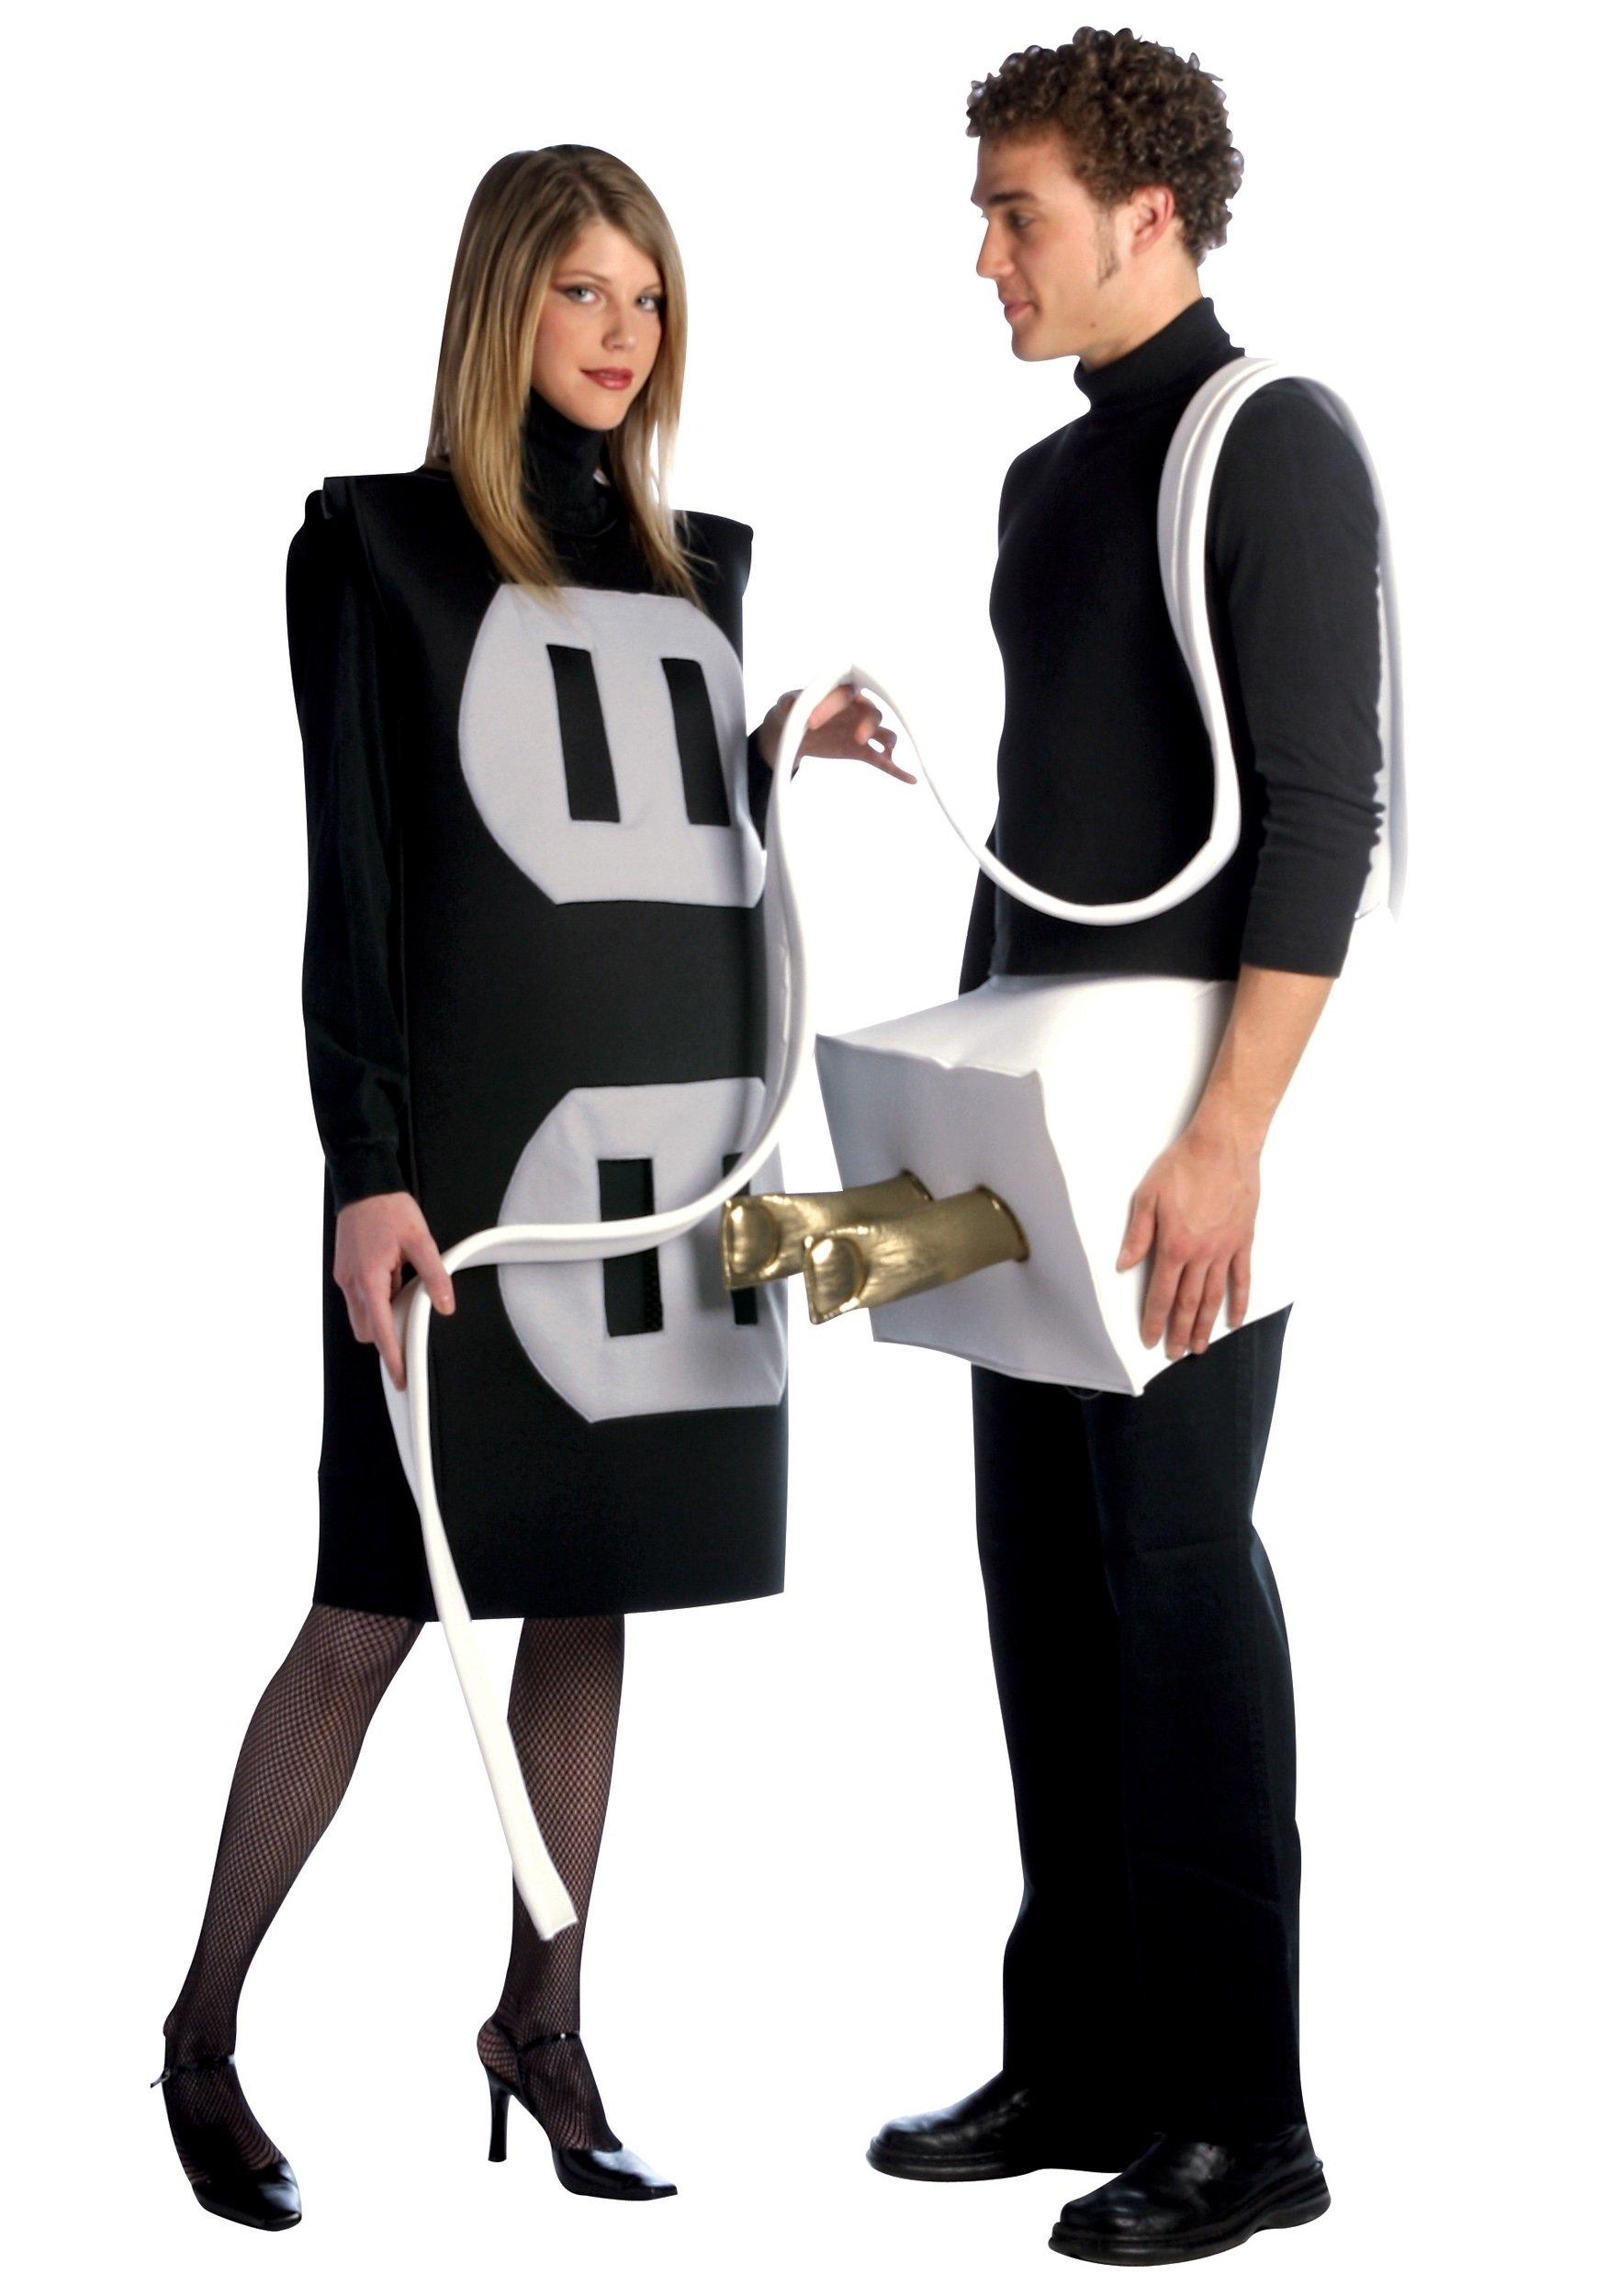 10 Wonderful Funny Couple Halloween Costumes Ideas plug and socket costume funny couples costume ideas 12 2020